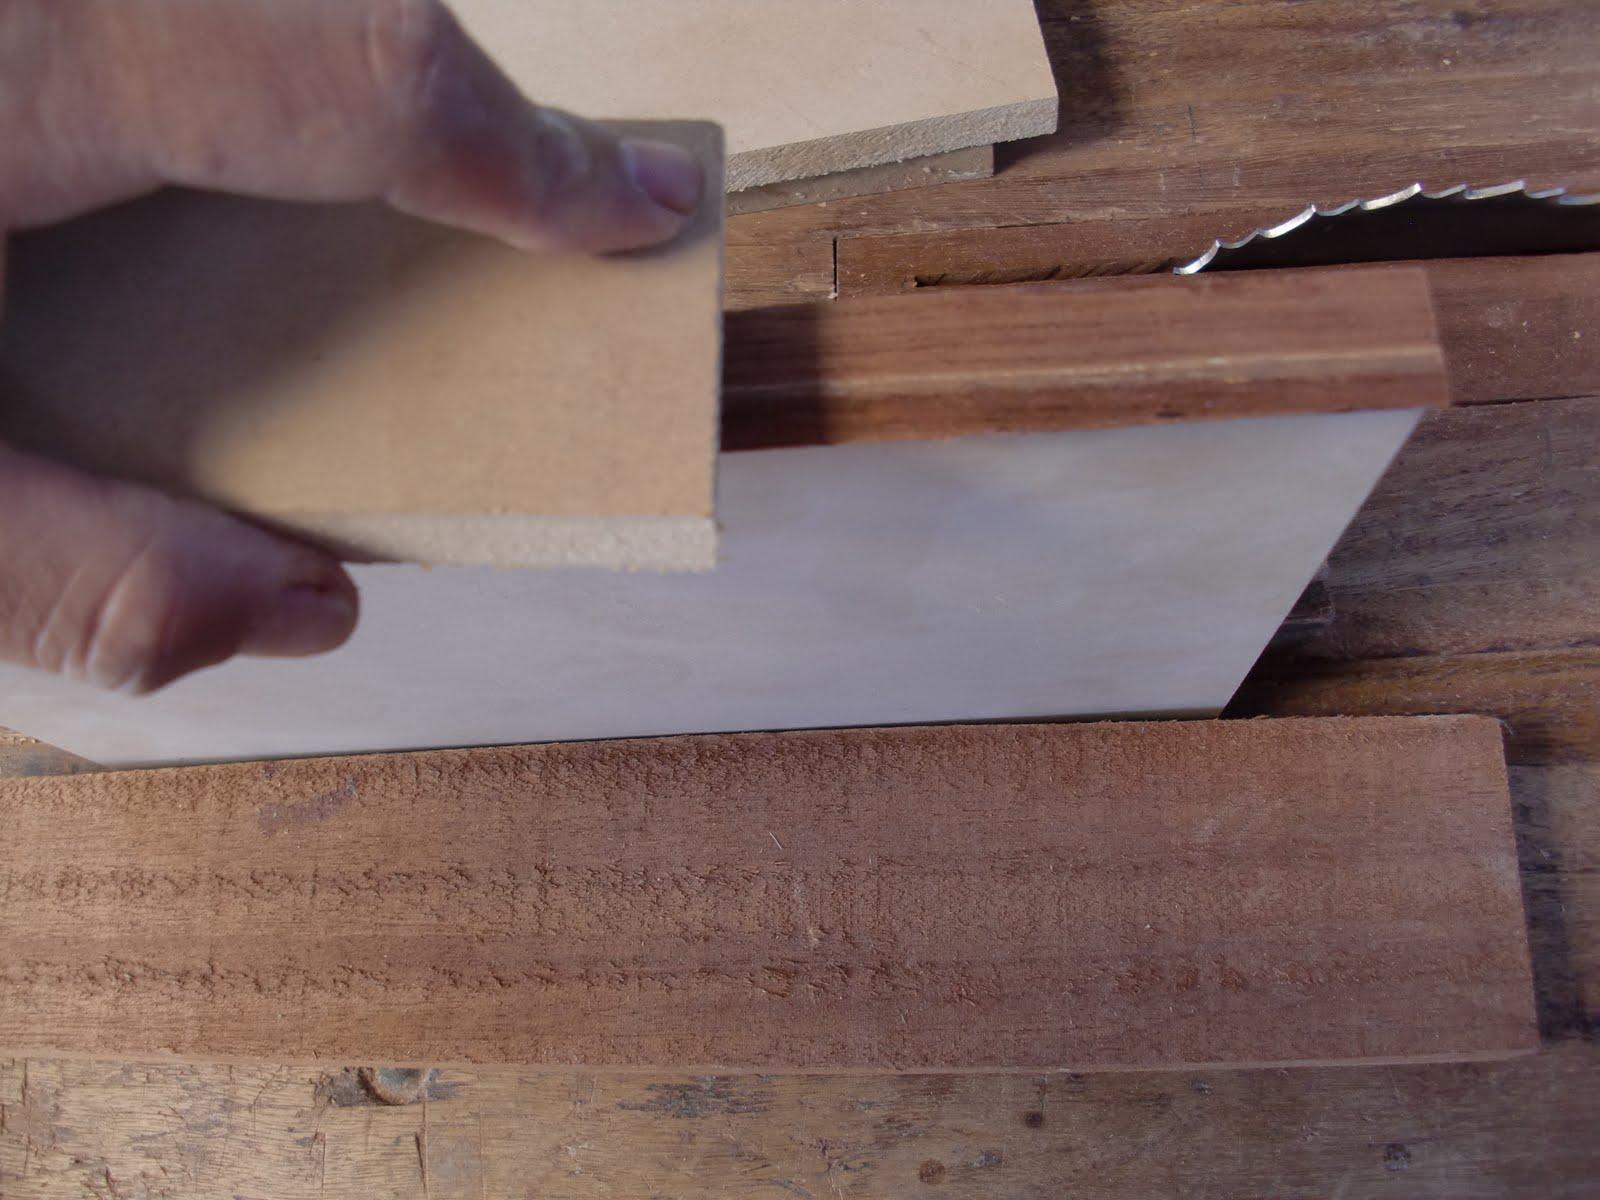 Laminas adhesivas para madera images for Laminas adhesivas pared